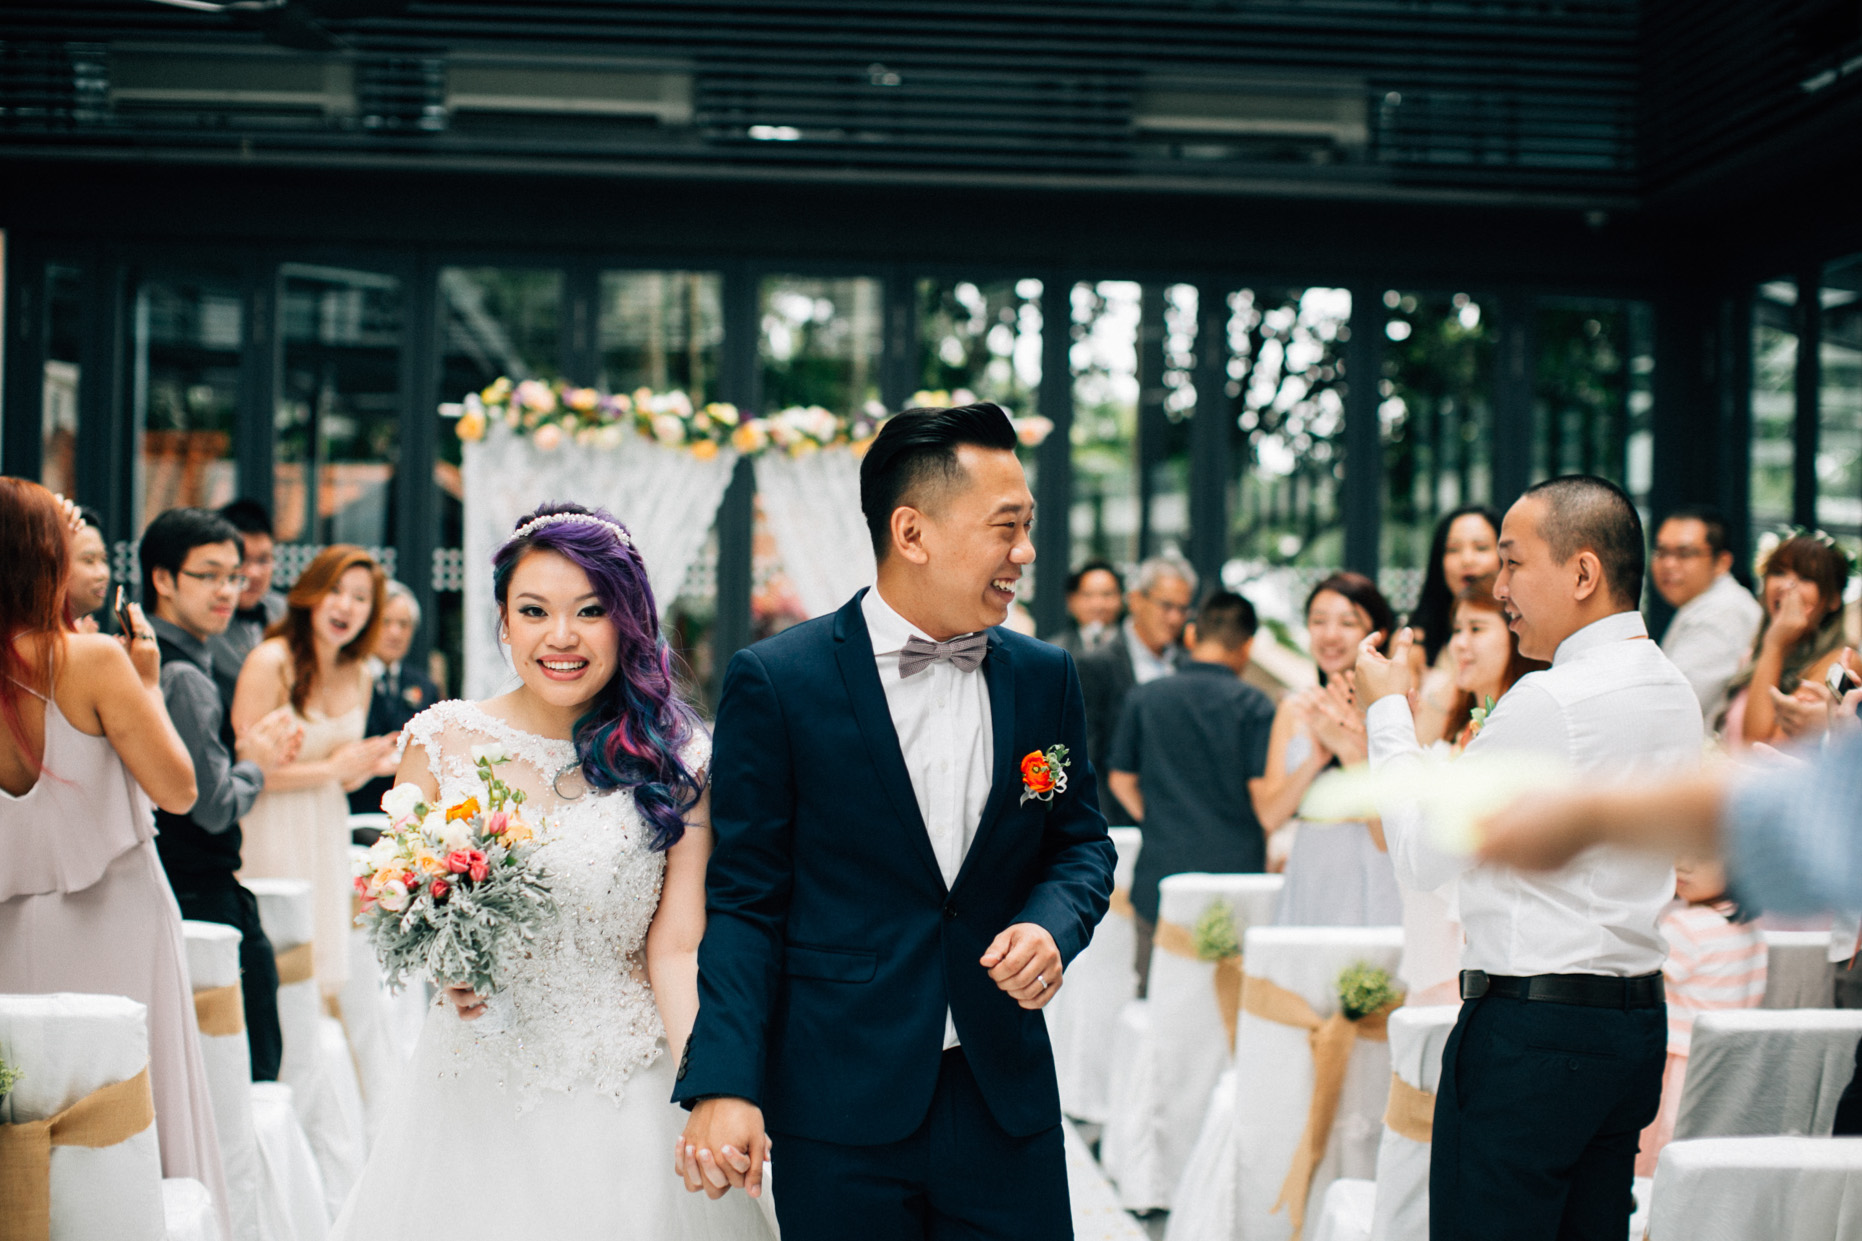 20-rom-le-meridien-wedding-hellojanelee-ryn